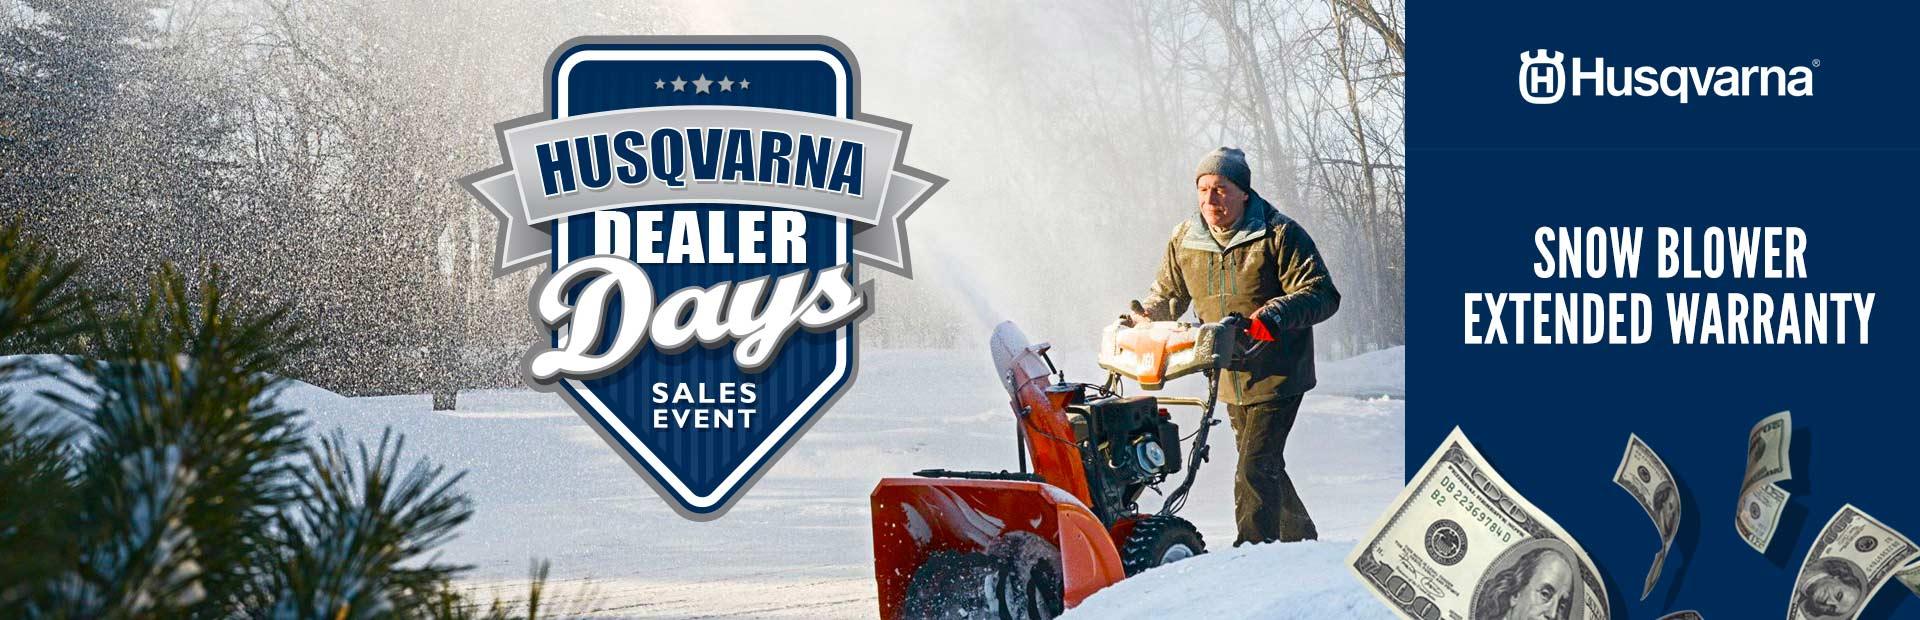 Husqvarna Snow Blower Extended Warranty Jones Power Sports Ltd